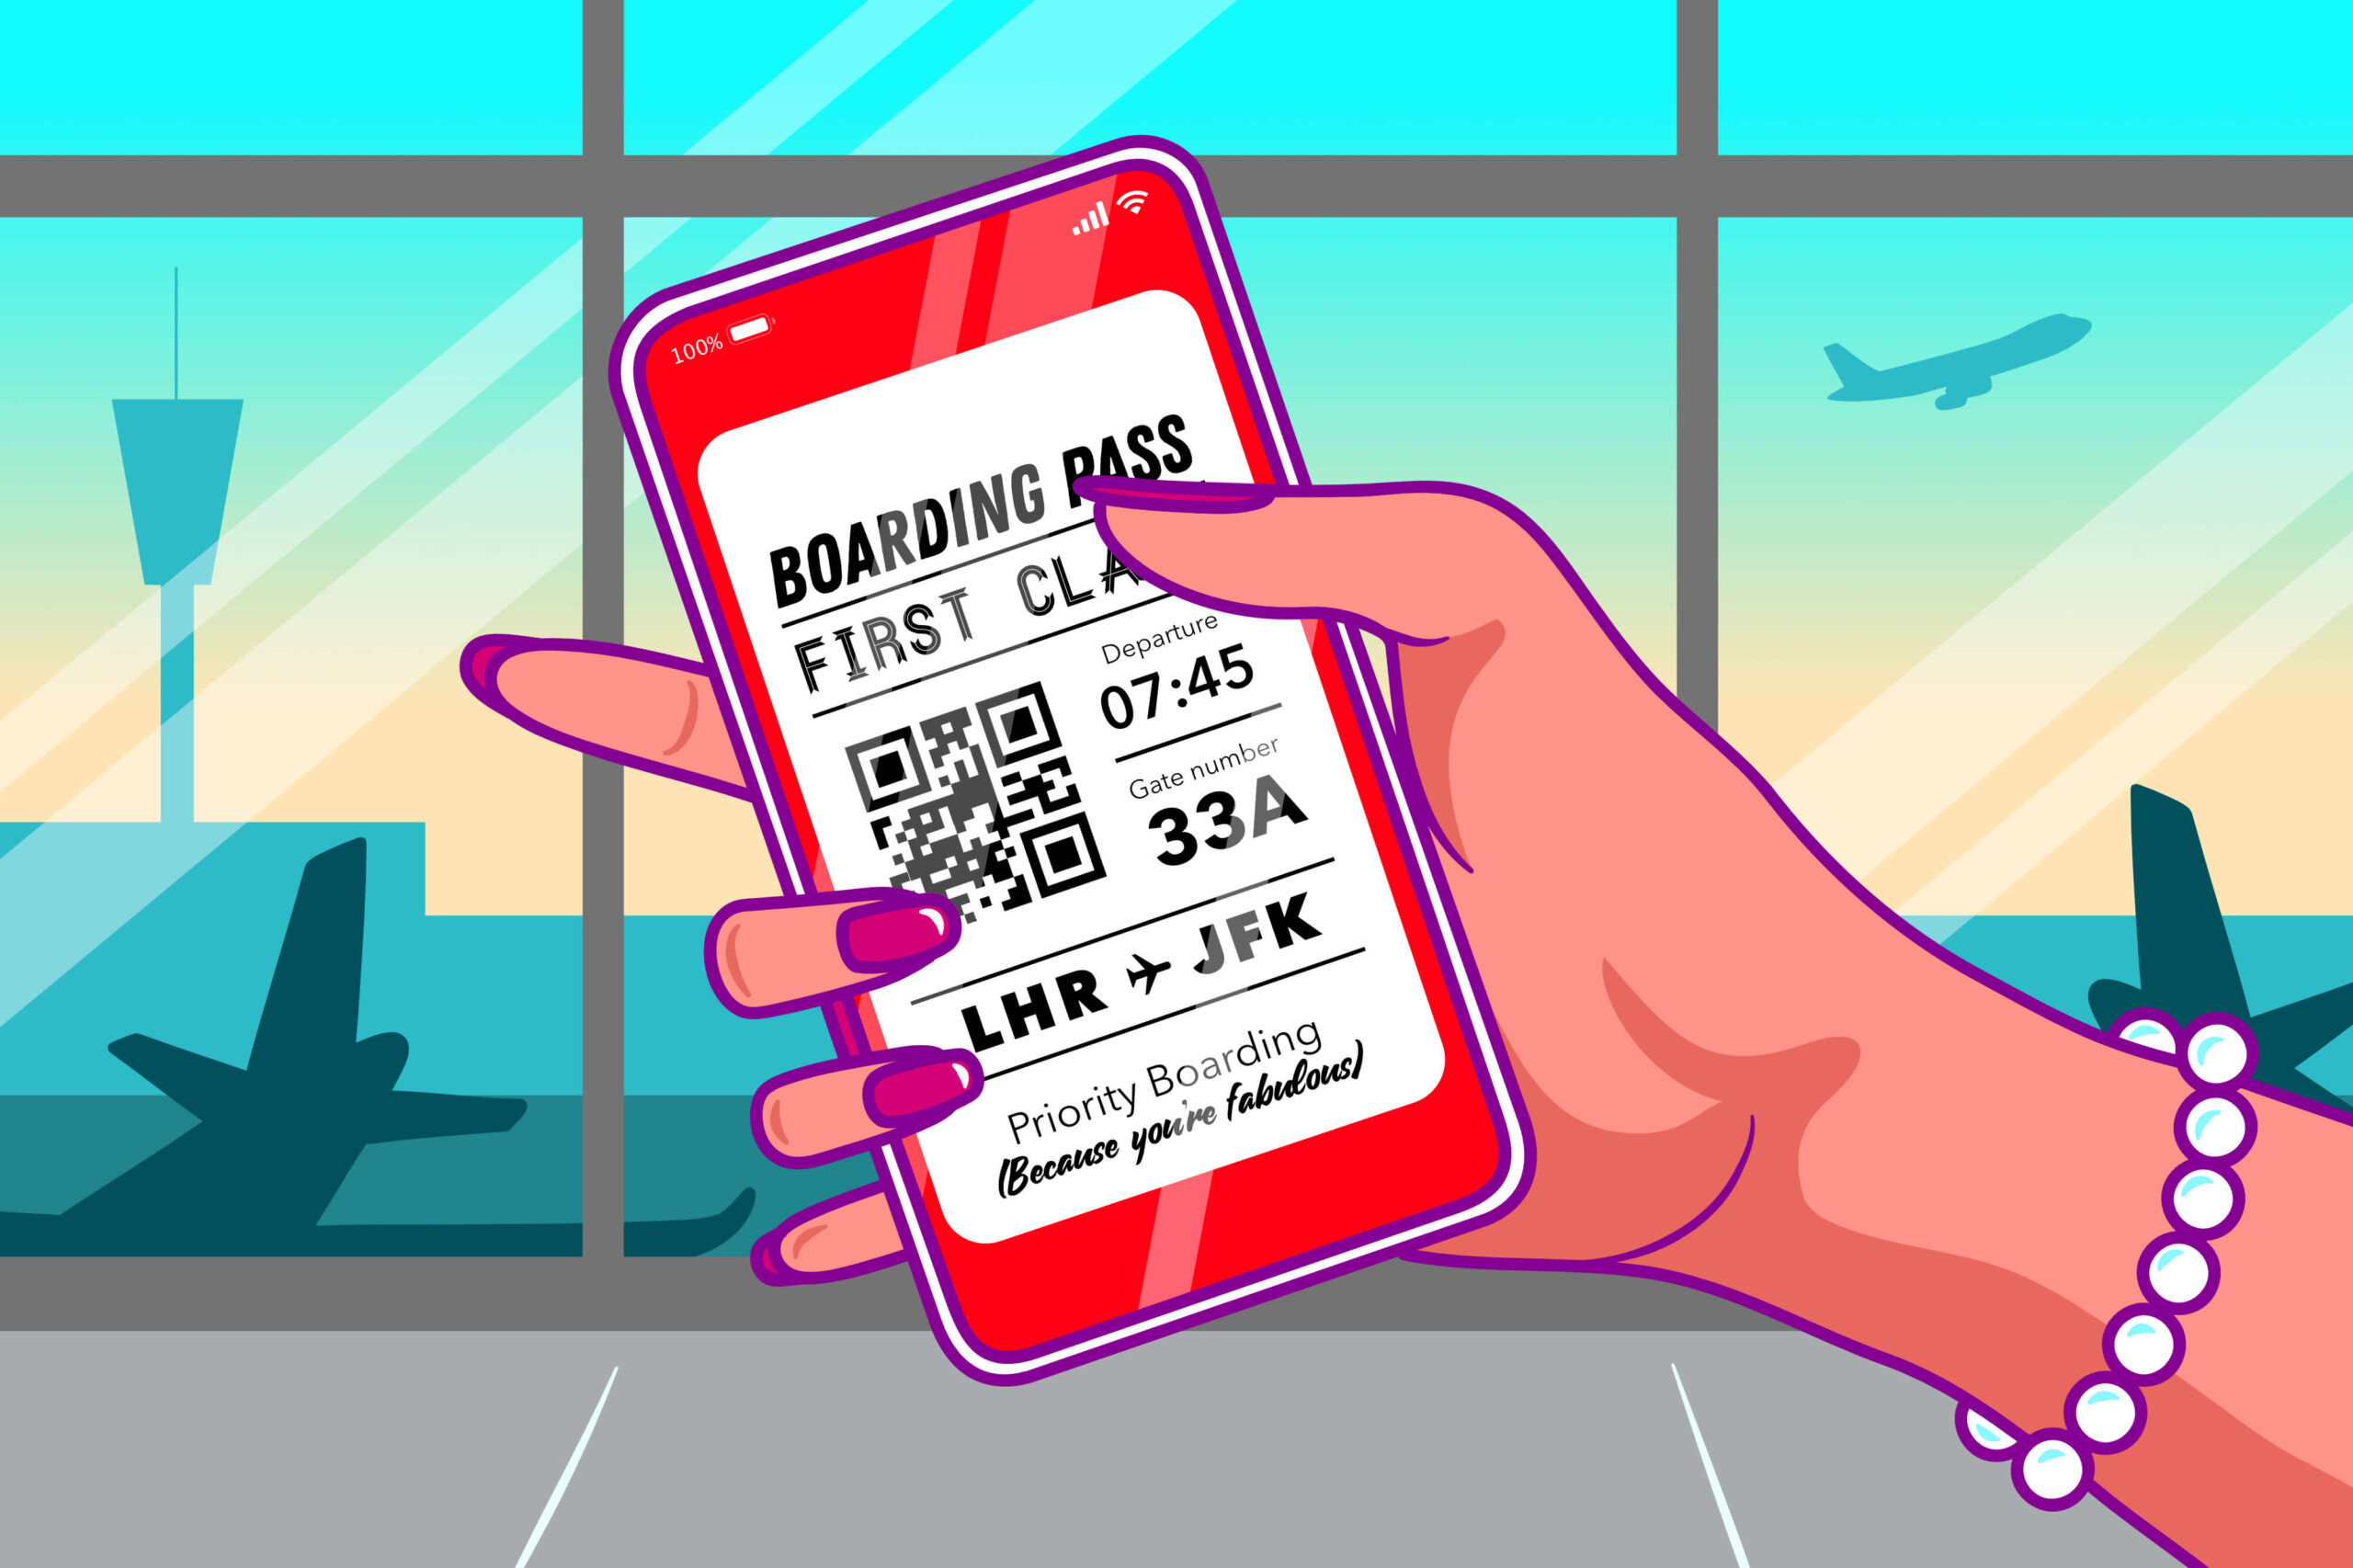 Generic Boarding Pass